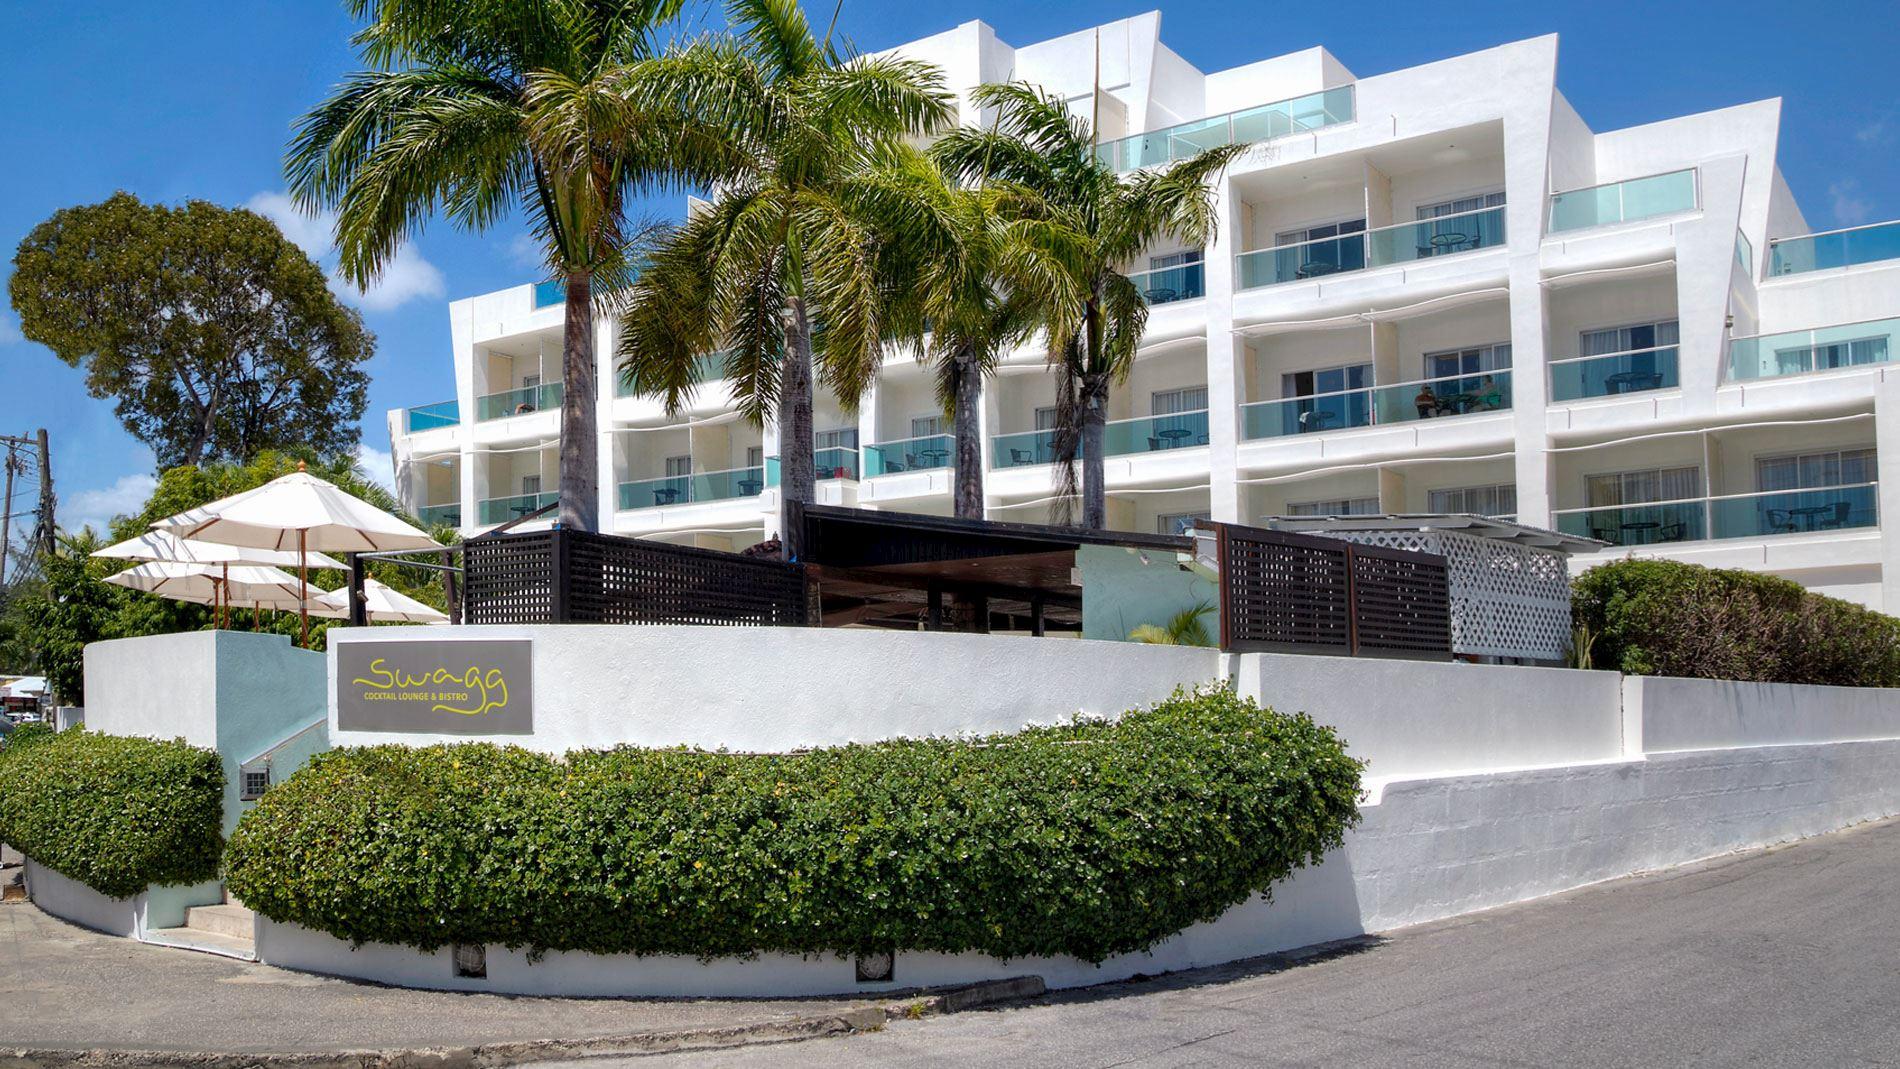 South Beach Hotel,Christ Church,Barbados,Top2